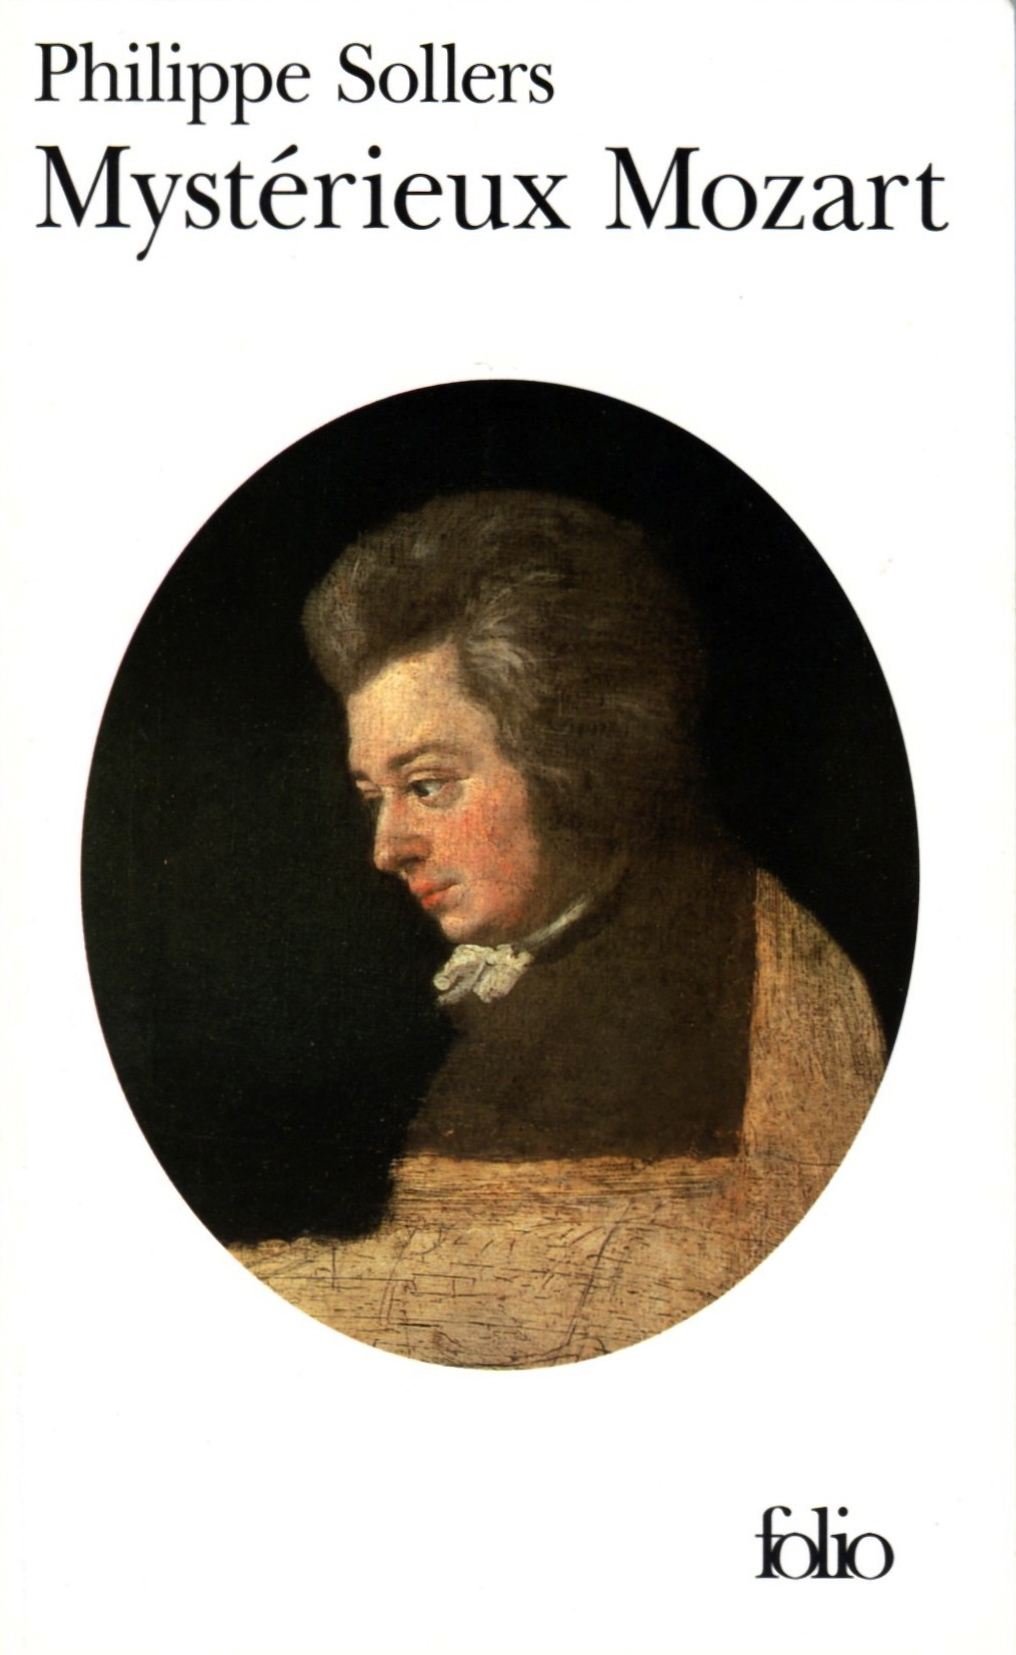 Philippe Sollers, Mystérieux Mozart, Folio n°3845